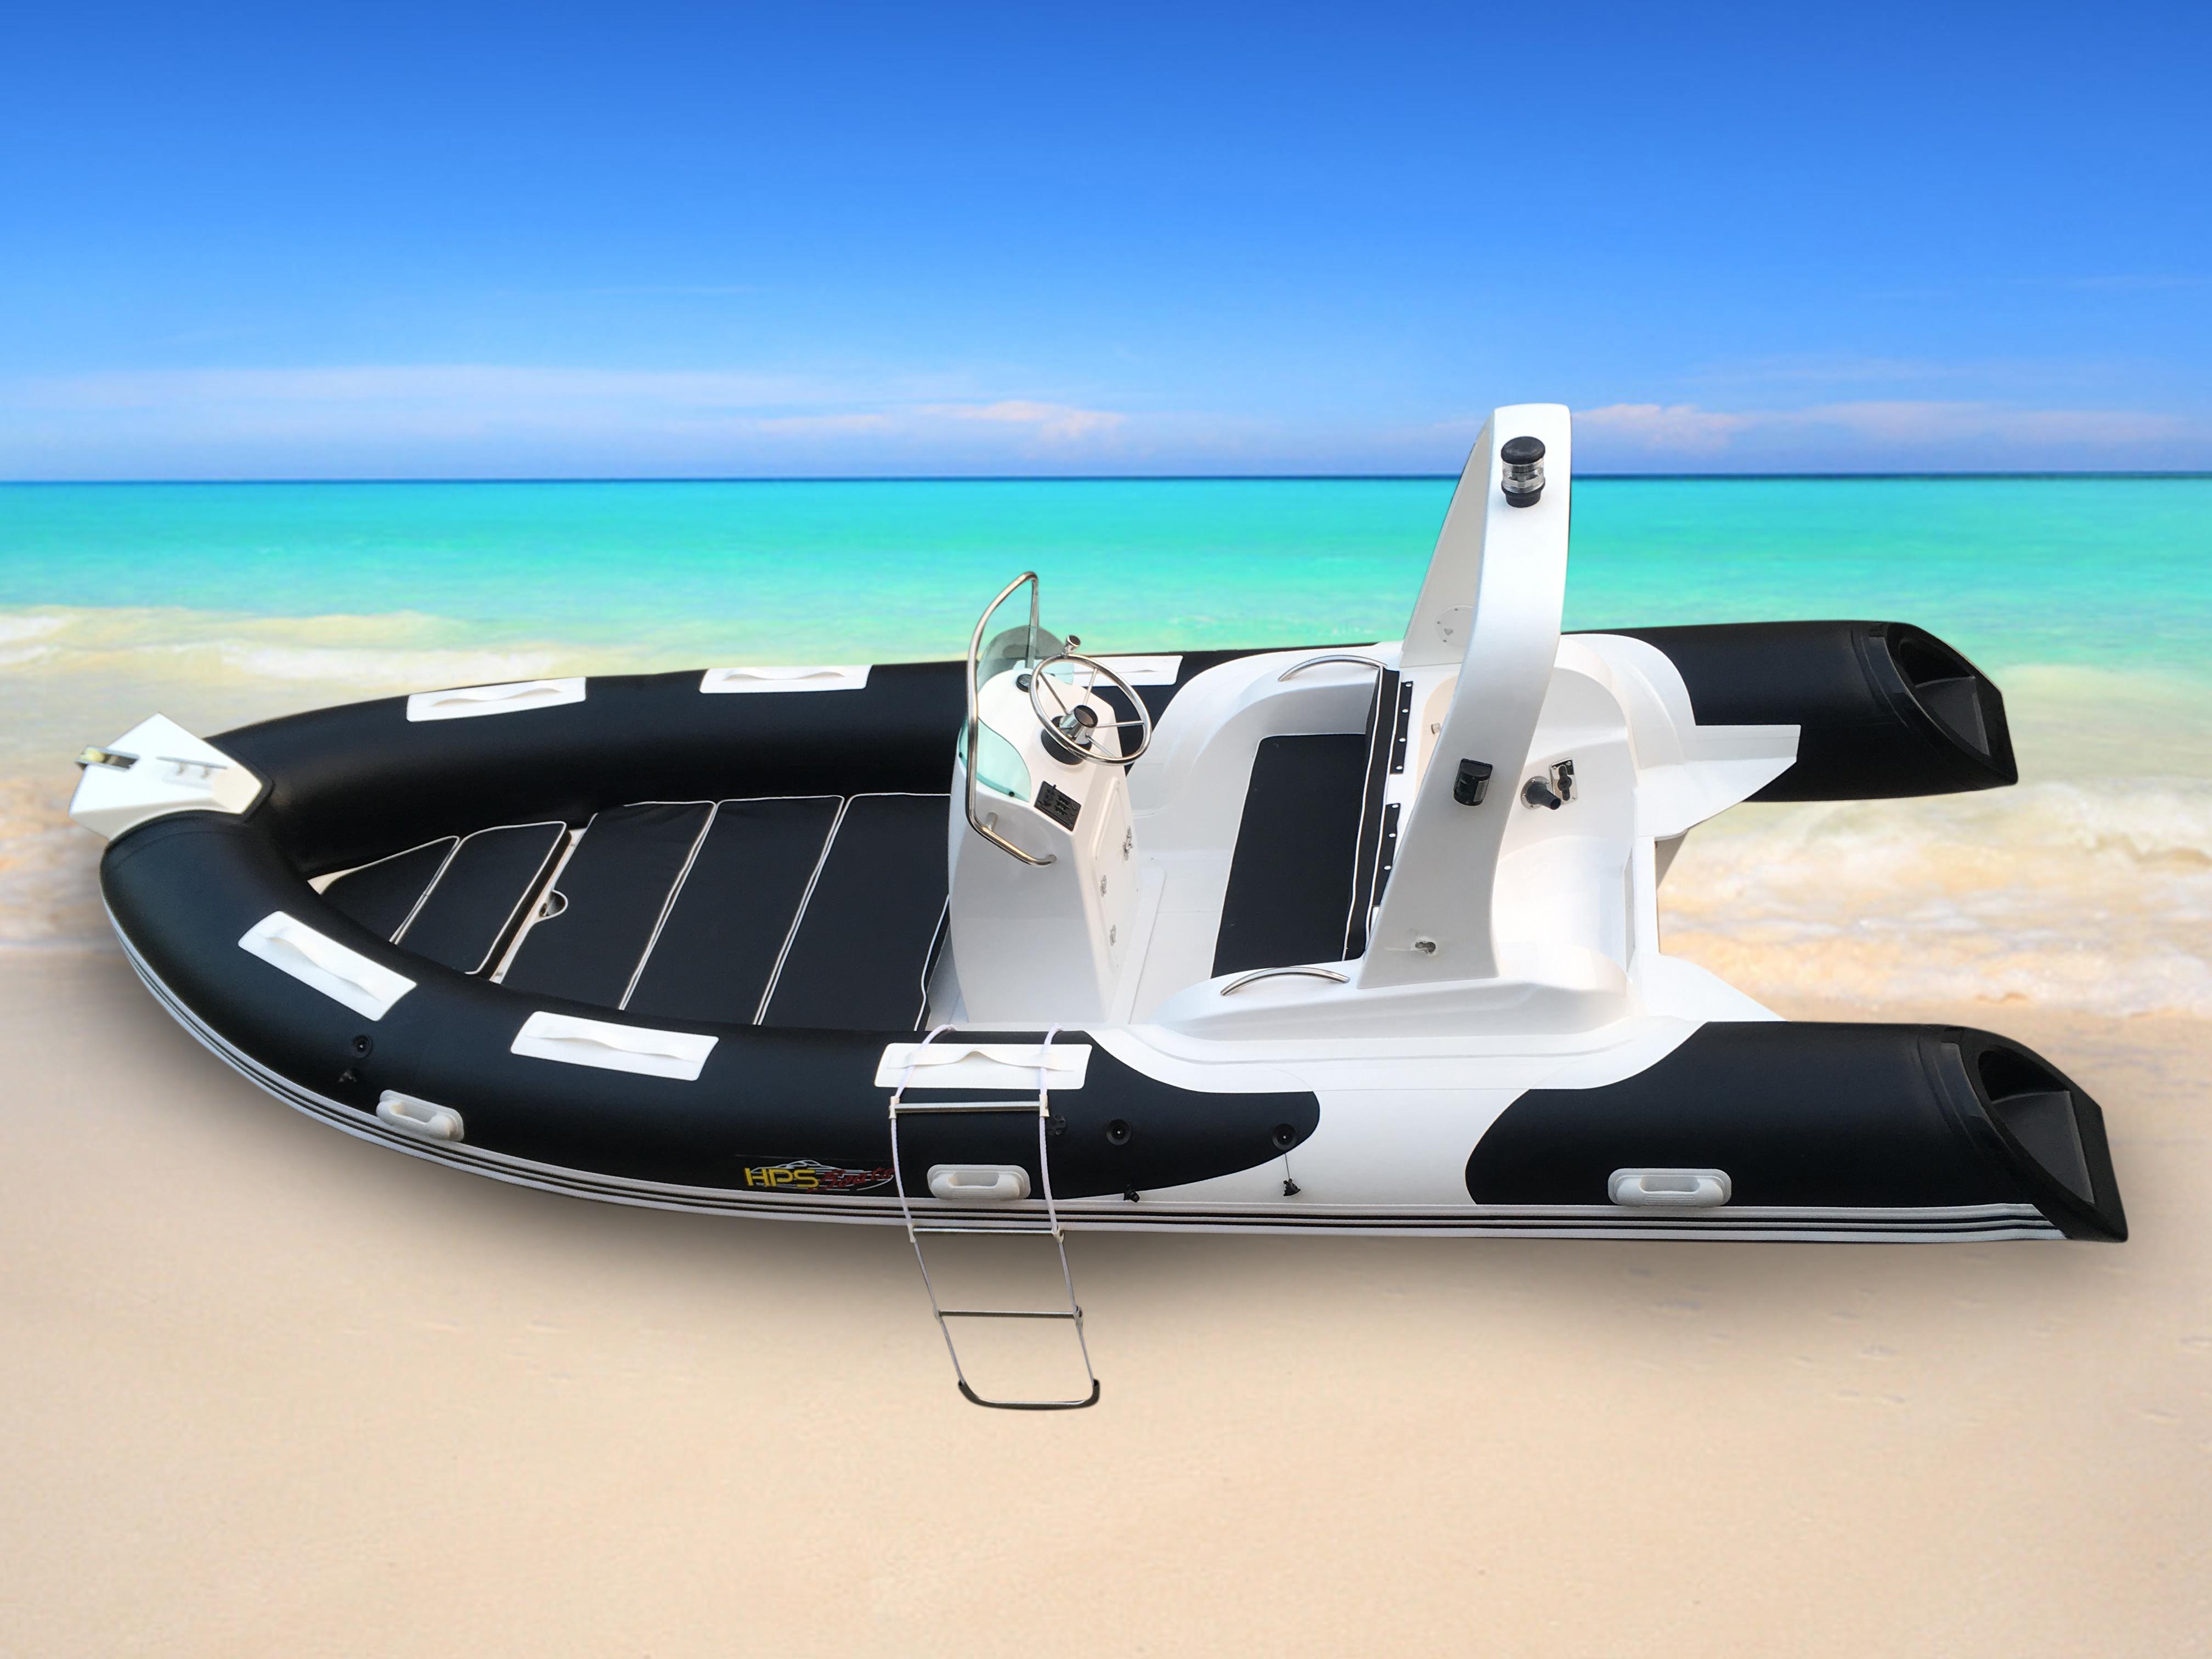 Rib Schlauchboot 5,20m